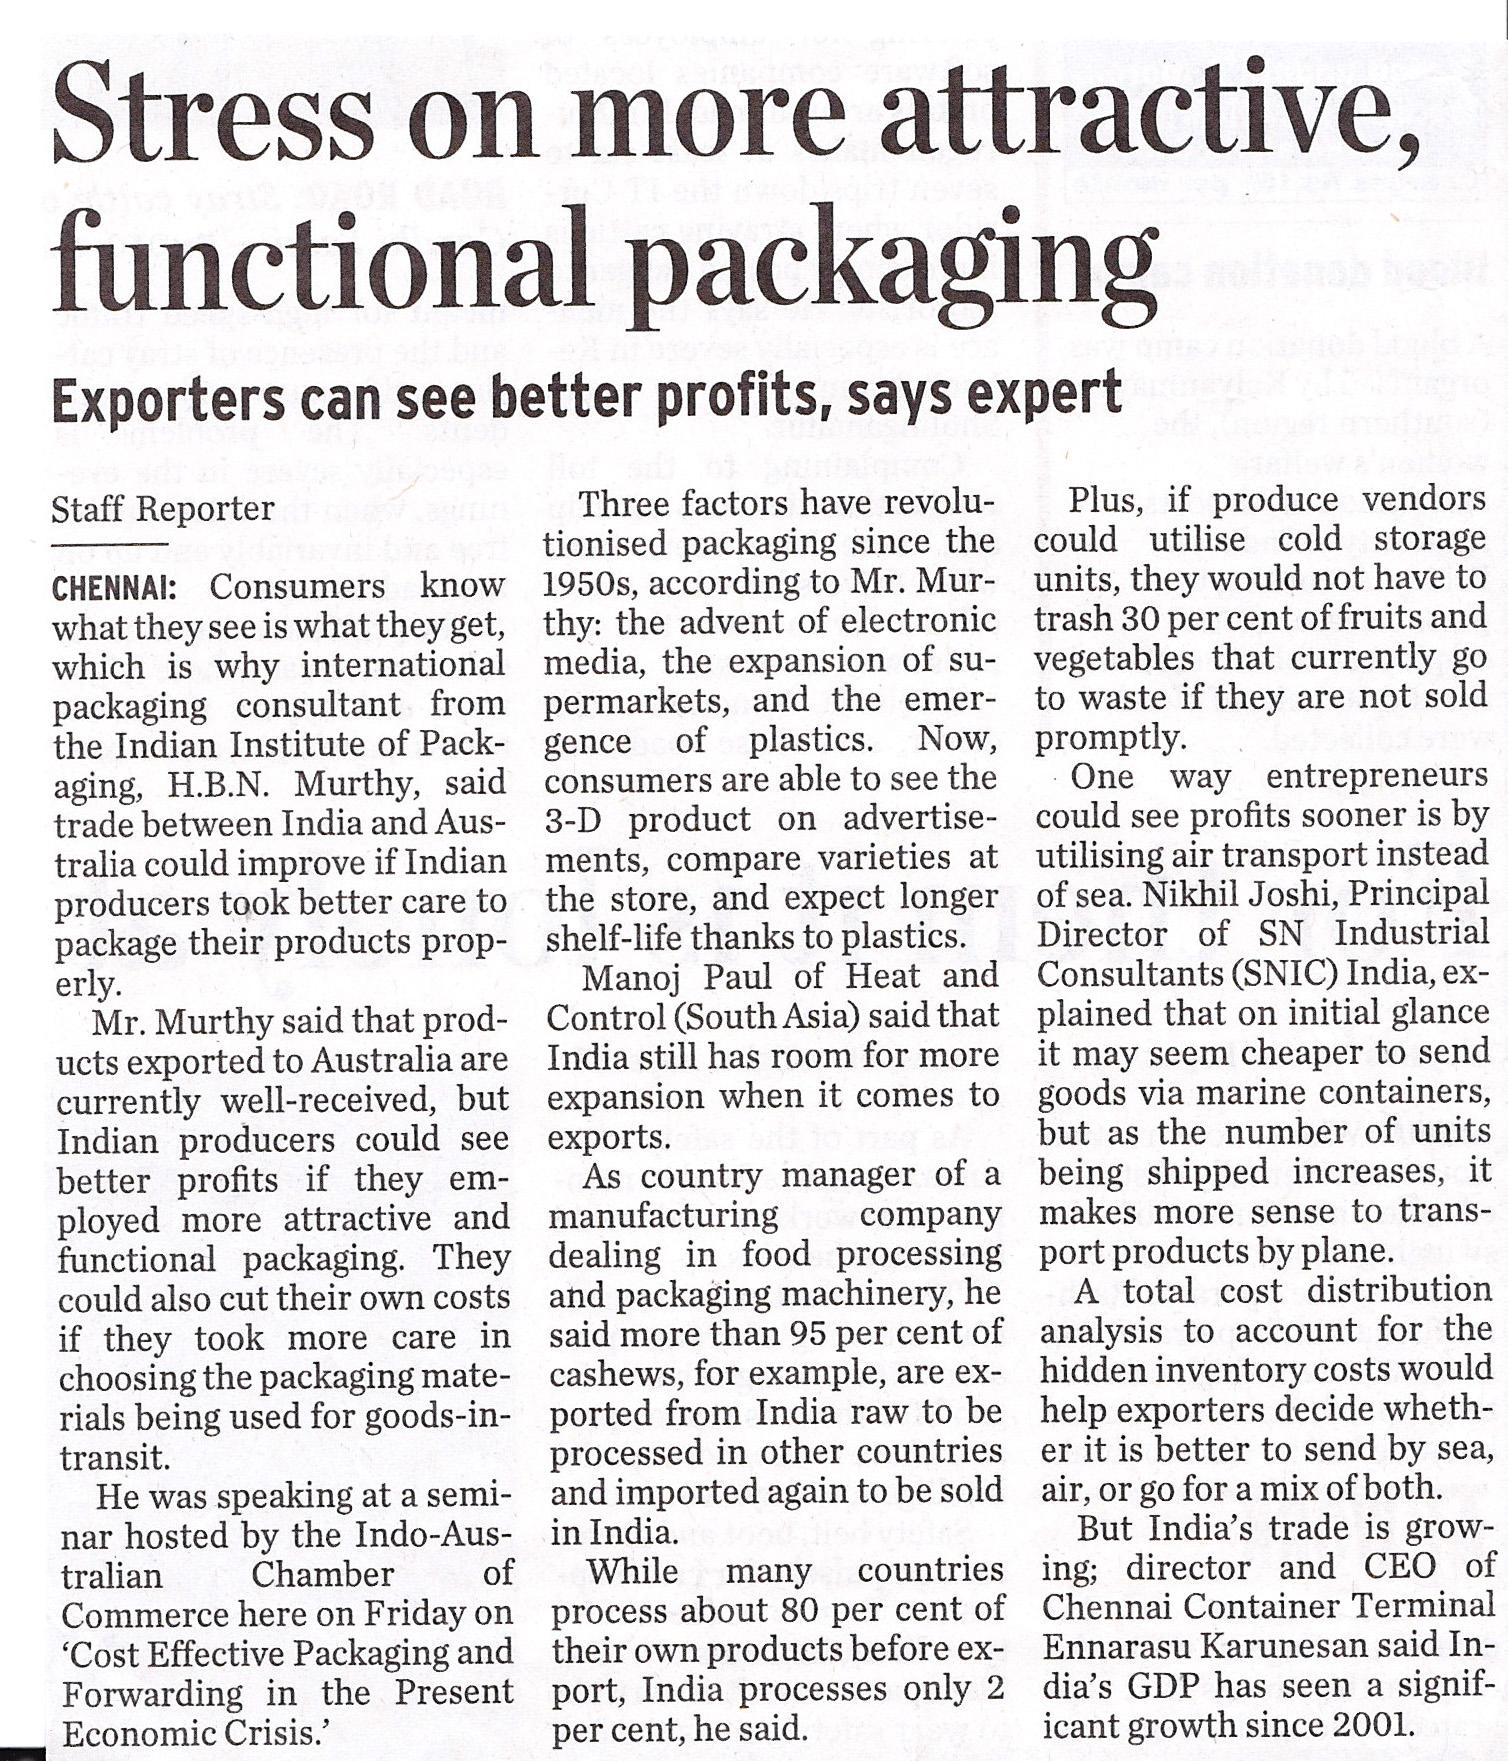 IND-Aus trade packaging